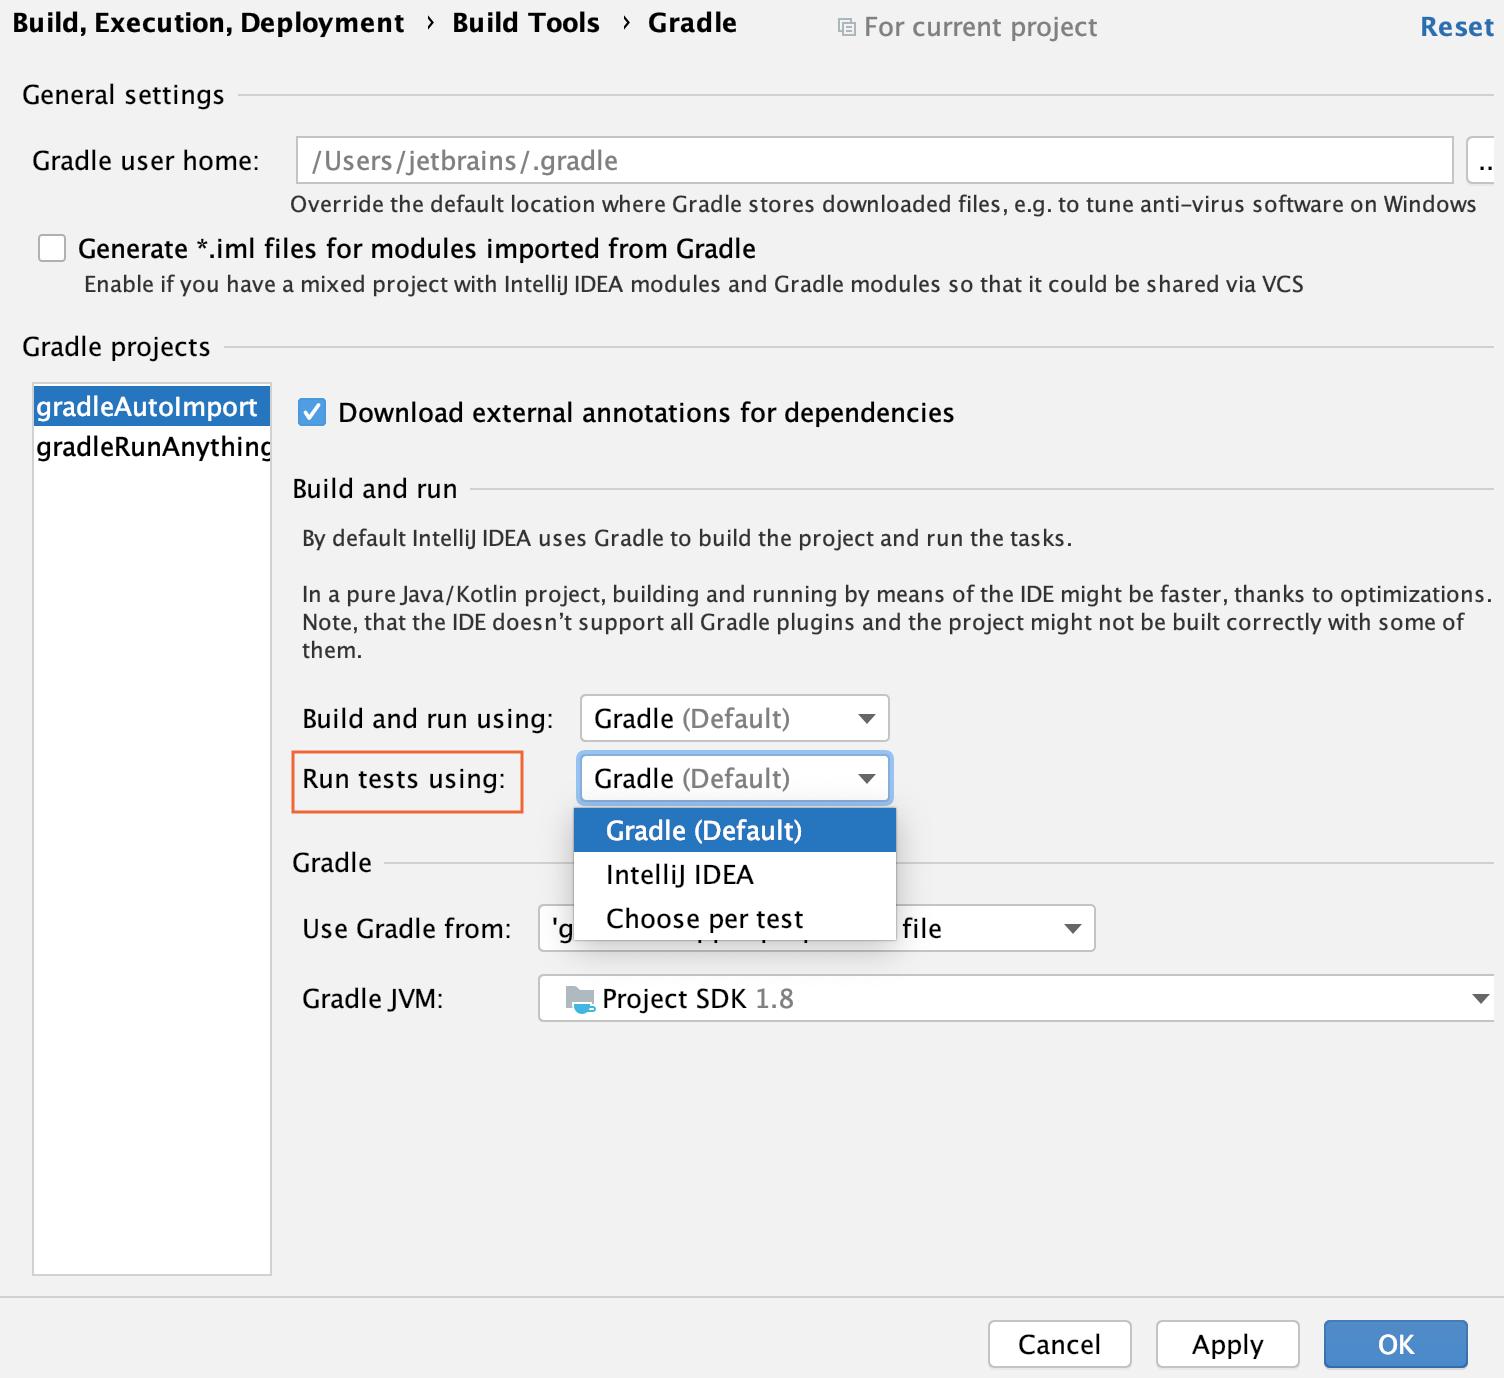 Gradle settings: the Run test using list